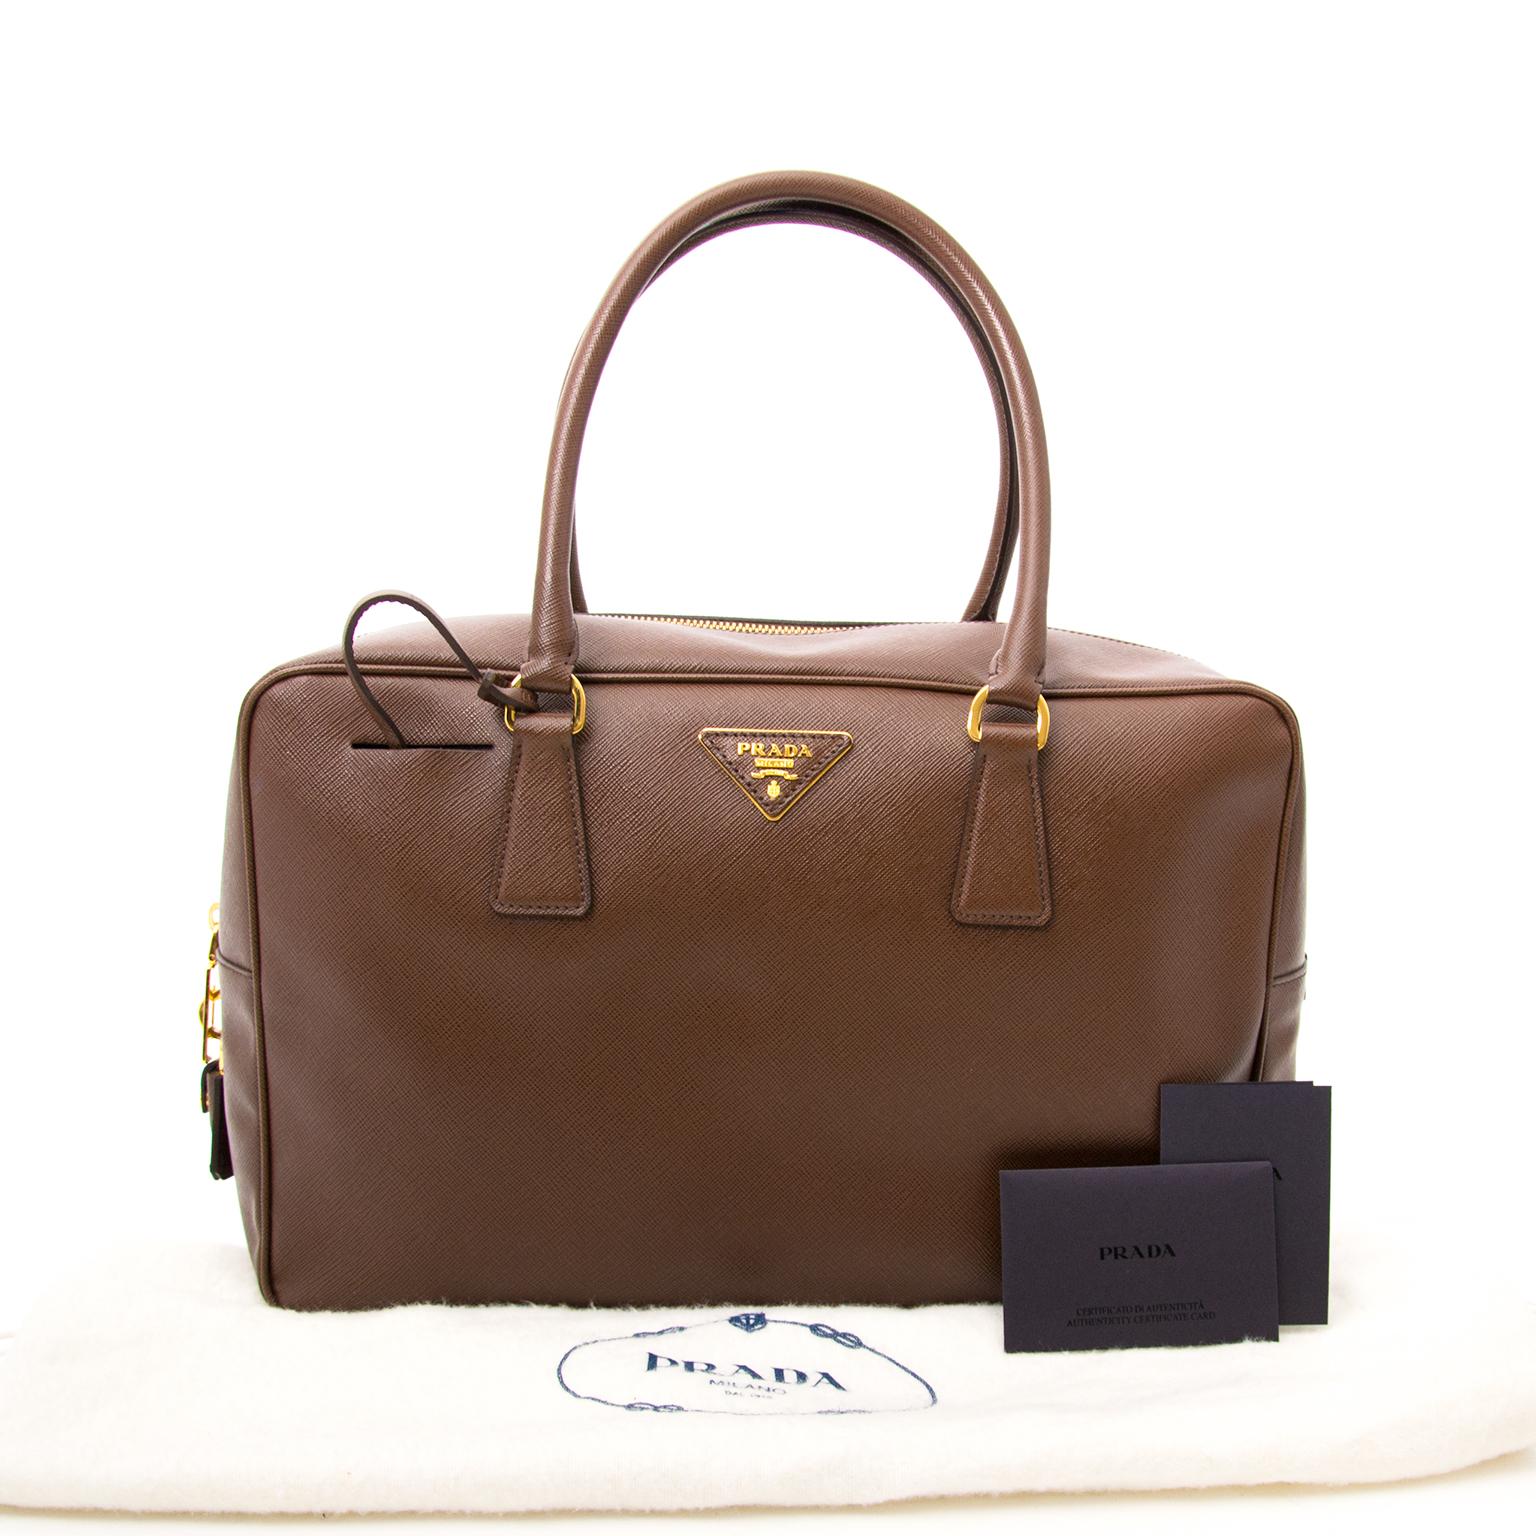 fedd920fc527 ... sale online Buy an authentic Prada Cacao Saffiano Lux Shoulder Bag  online